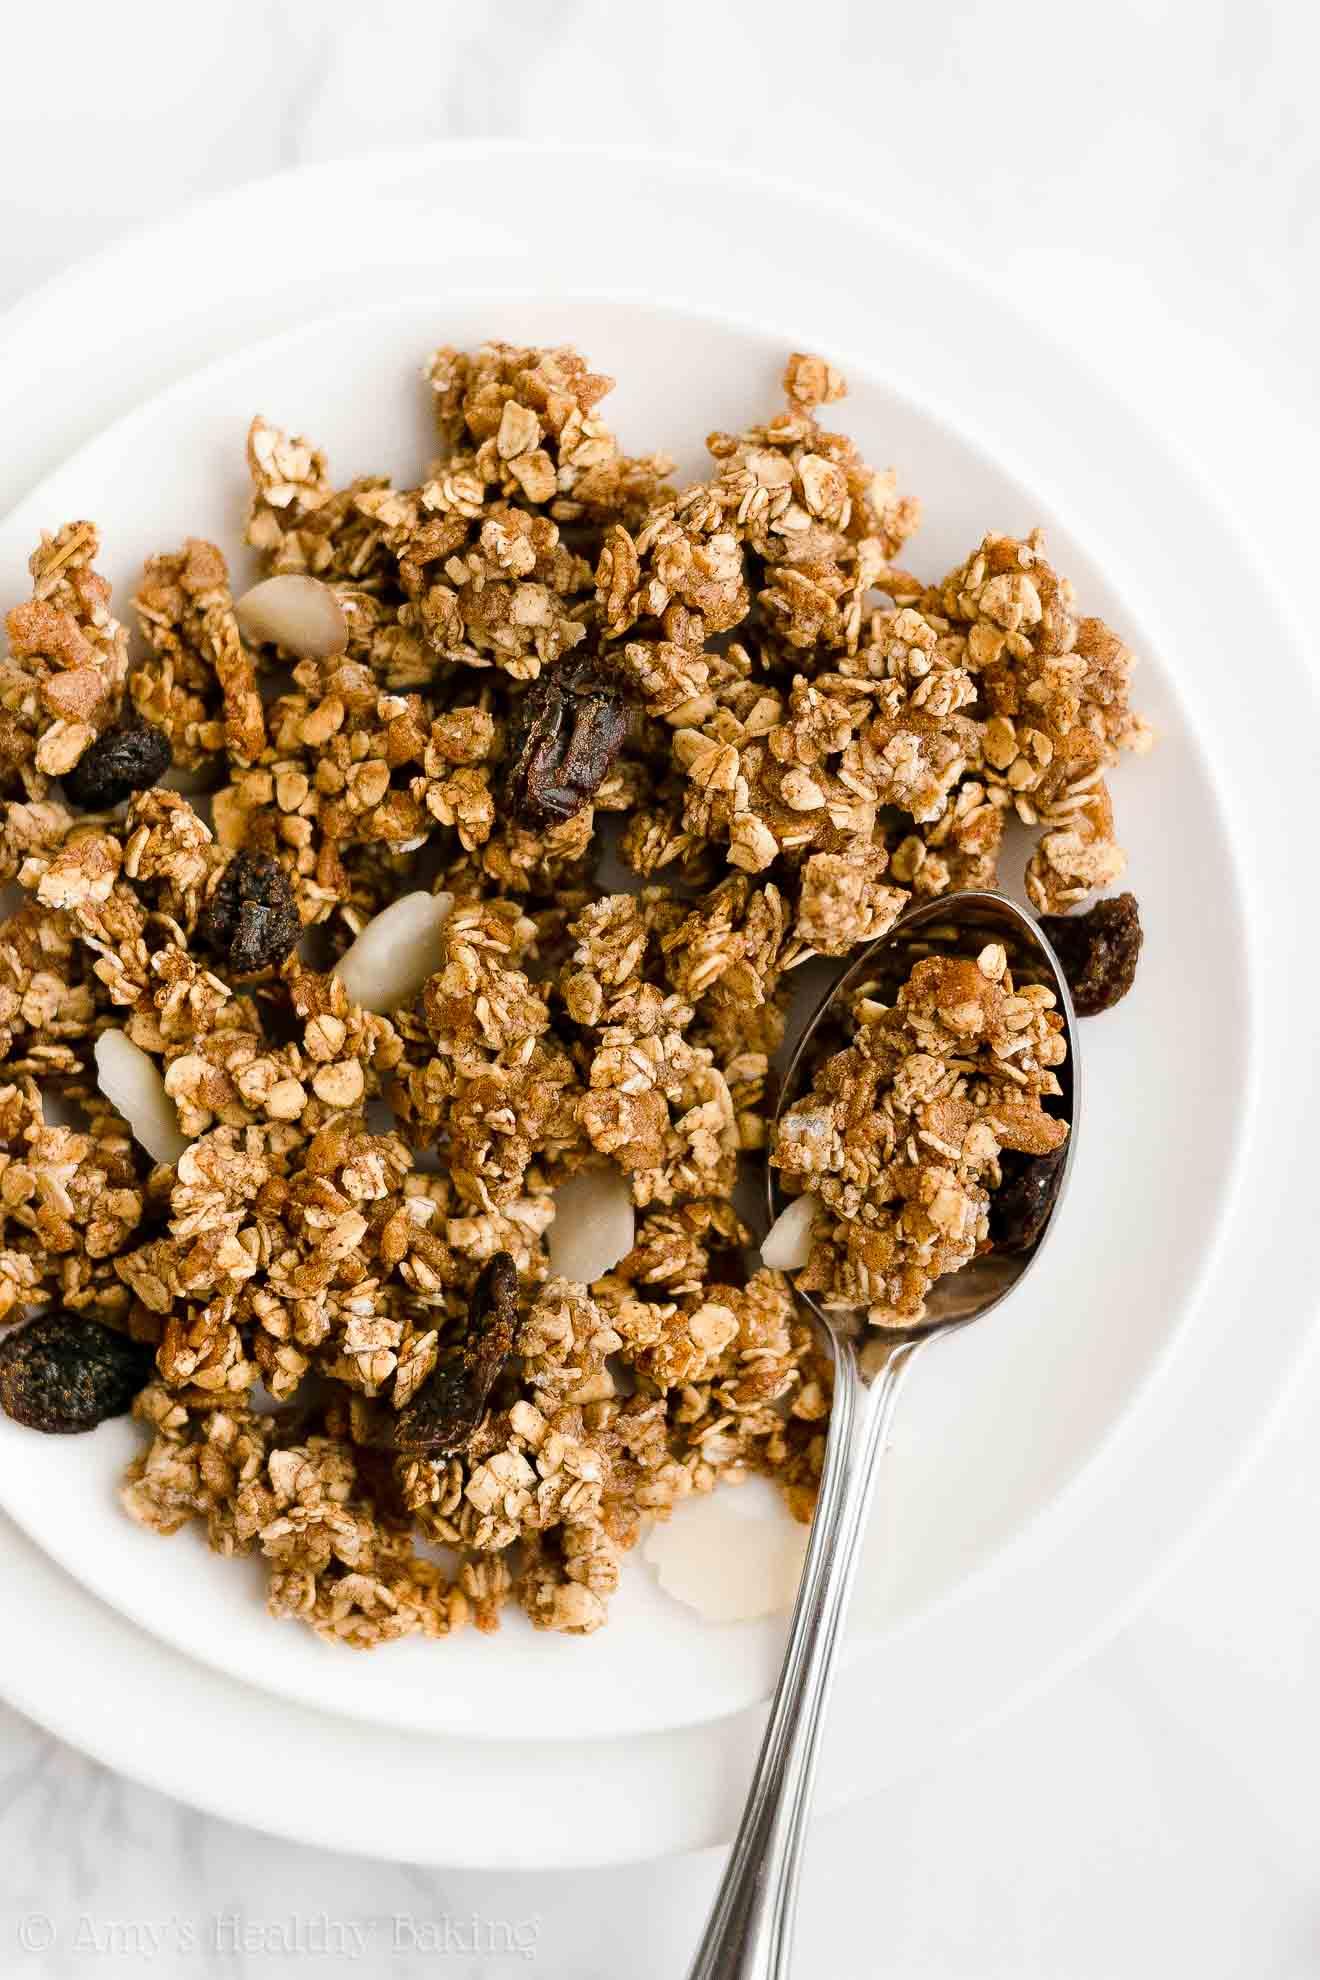 healthy granola recipe - best homemade granola with cinnamon & no oil or dairy